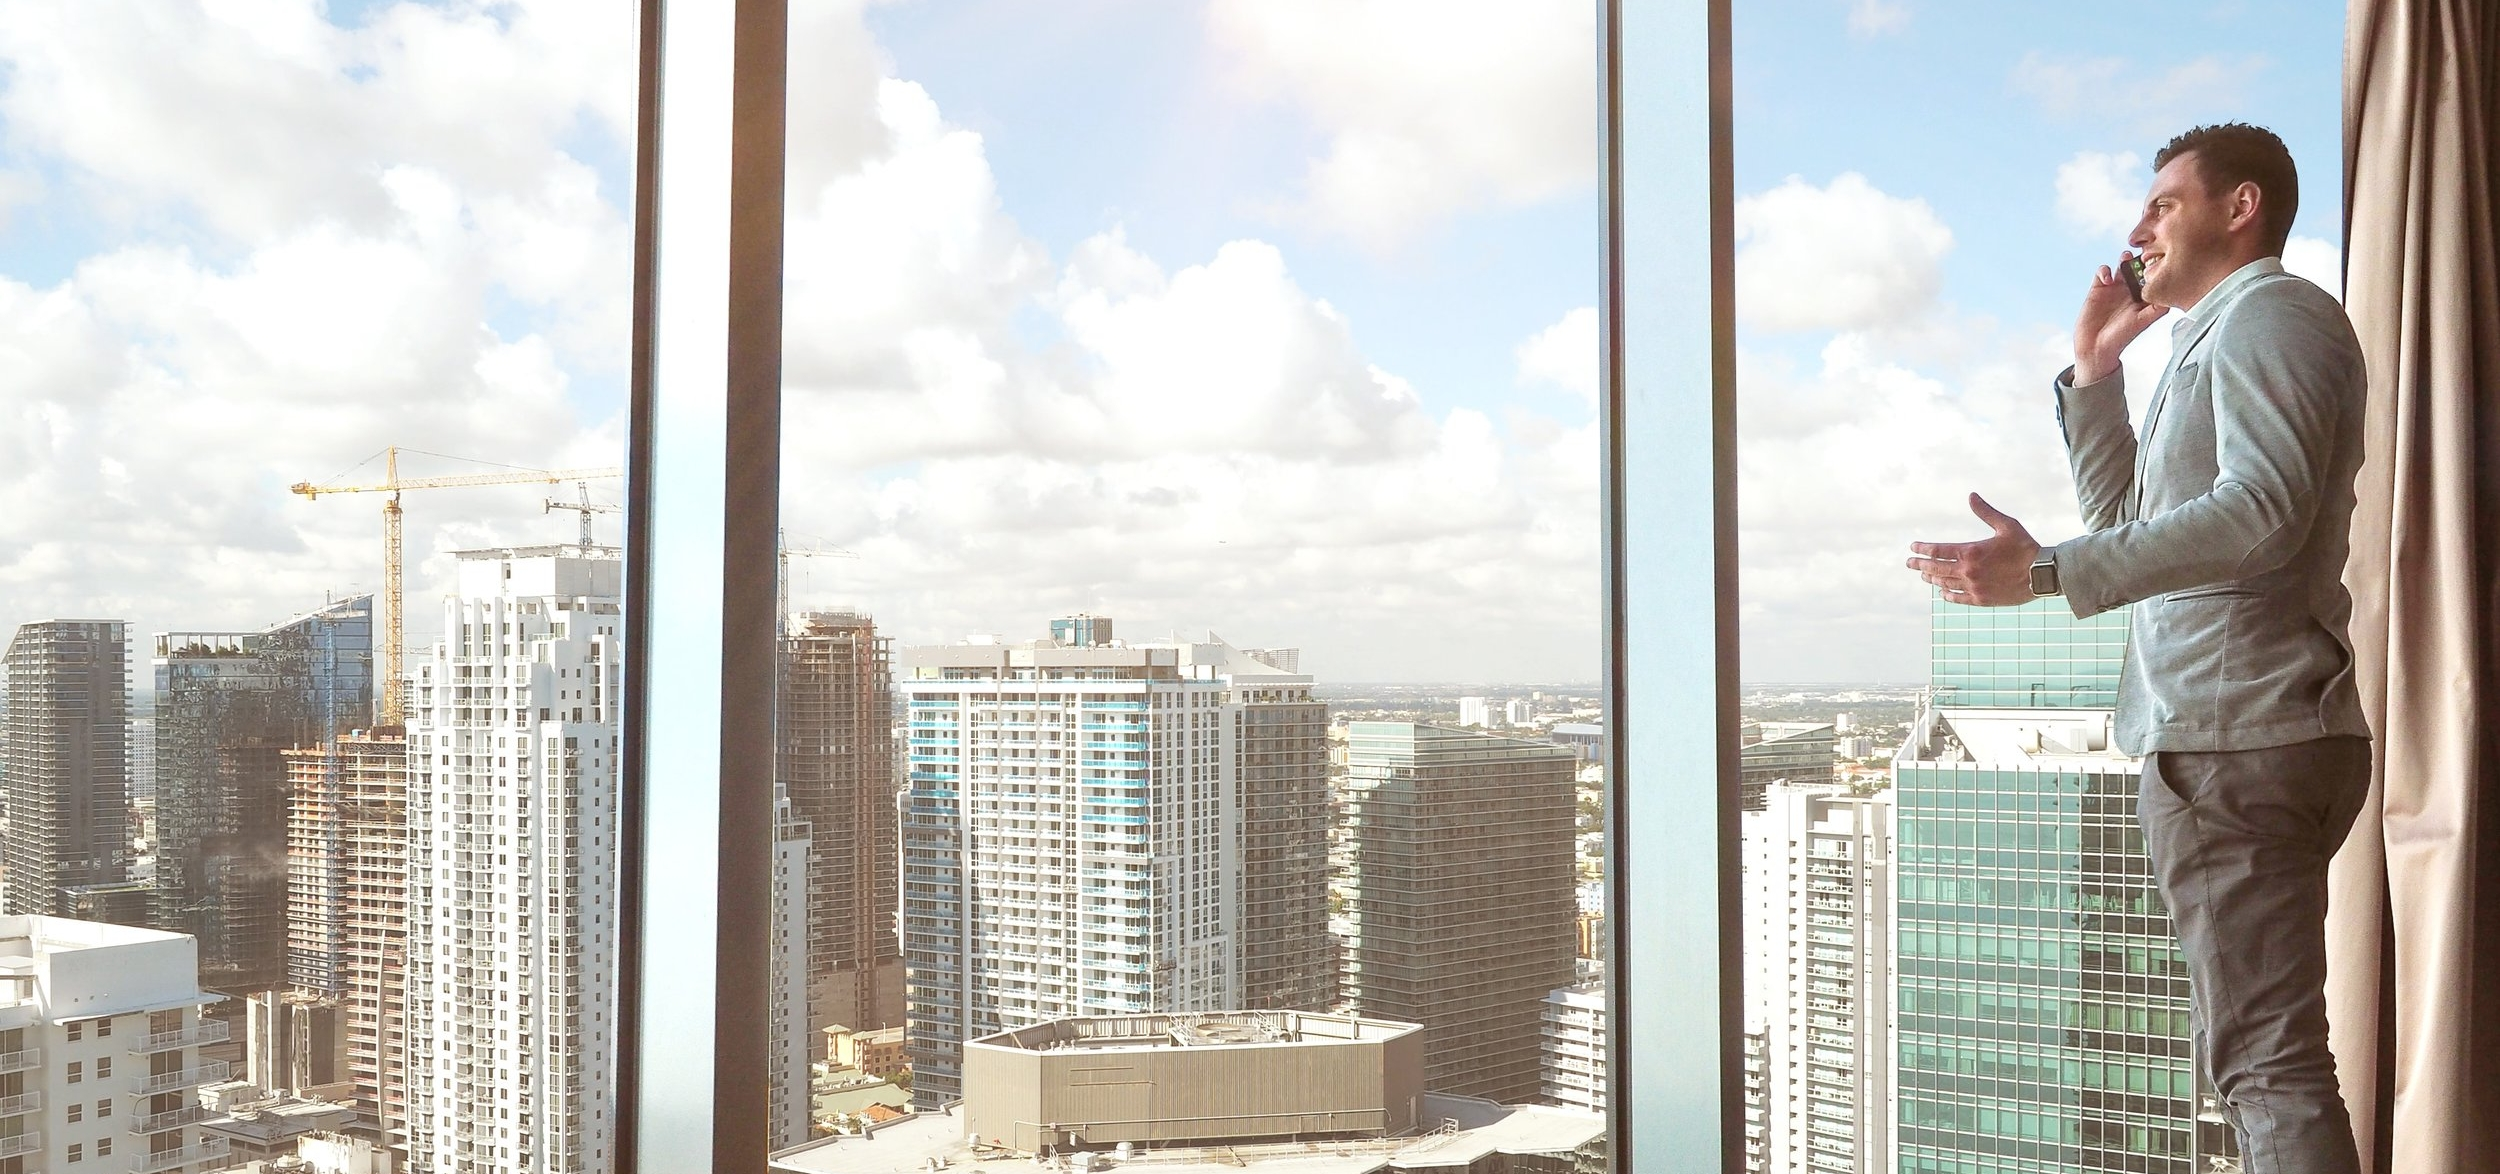 buildings-businessman-city-561458.jpg